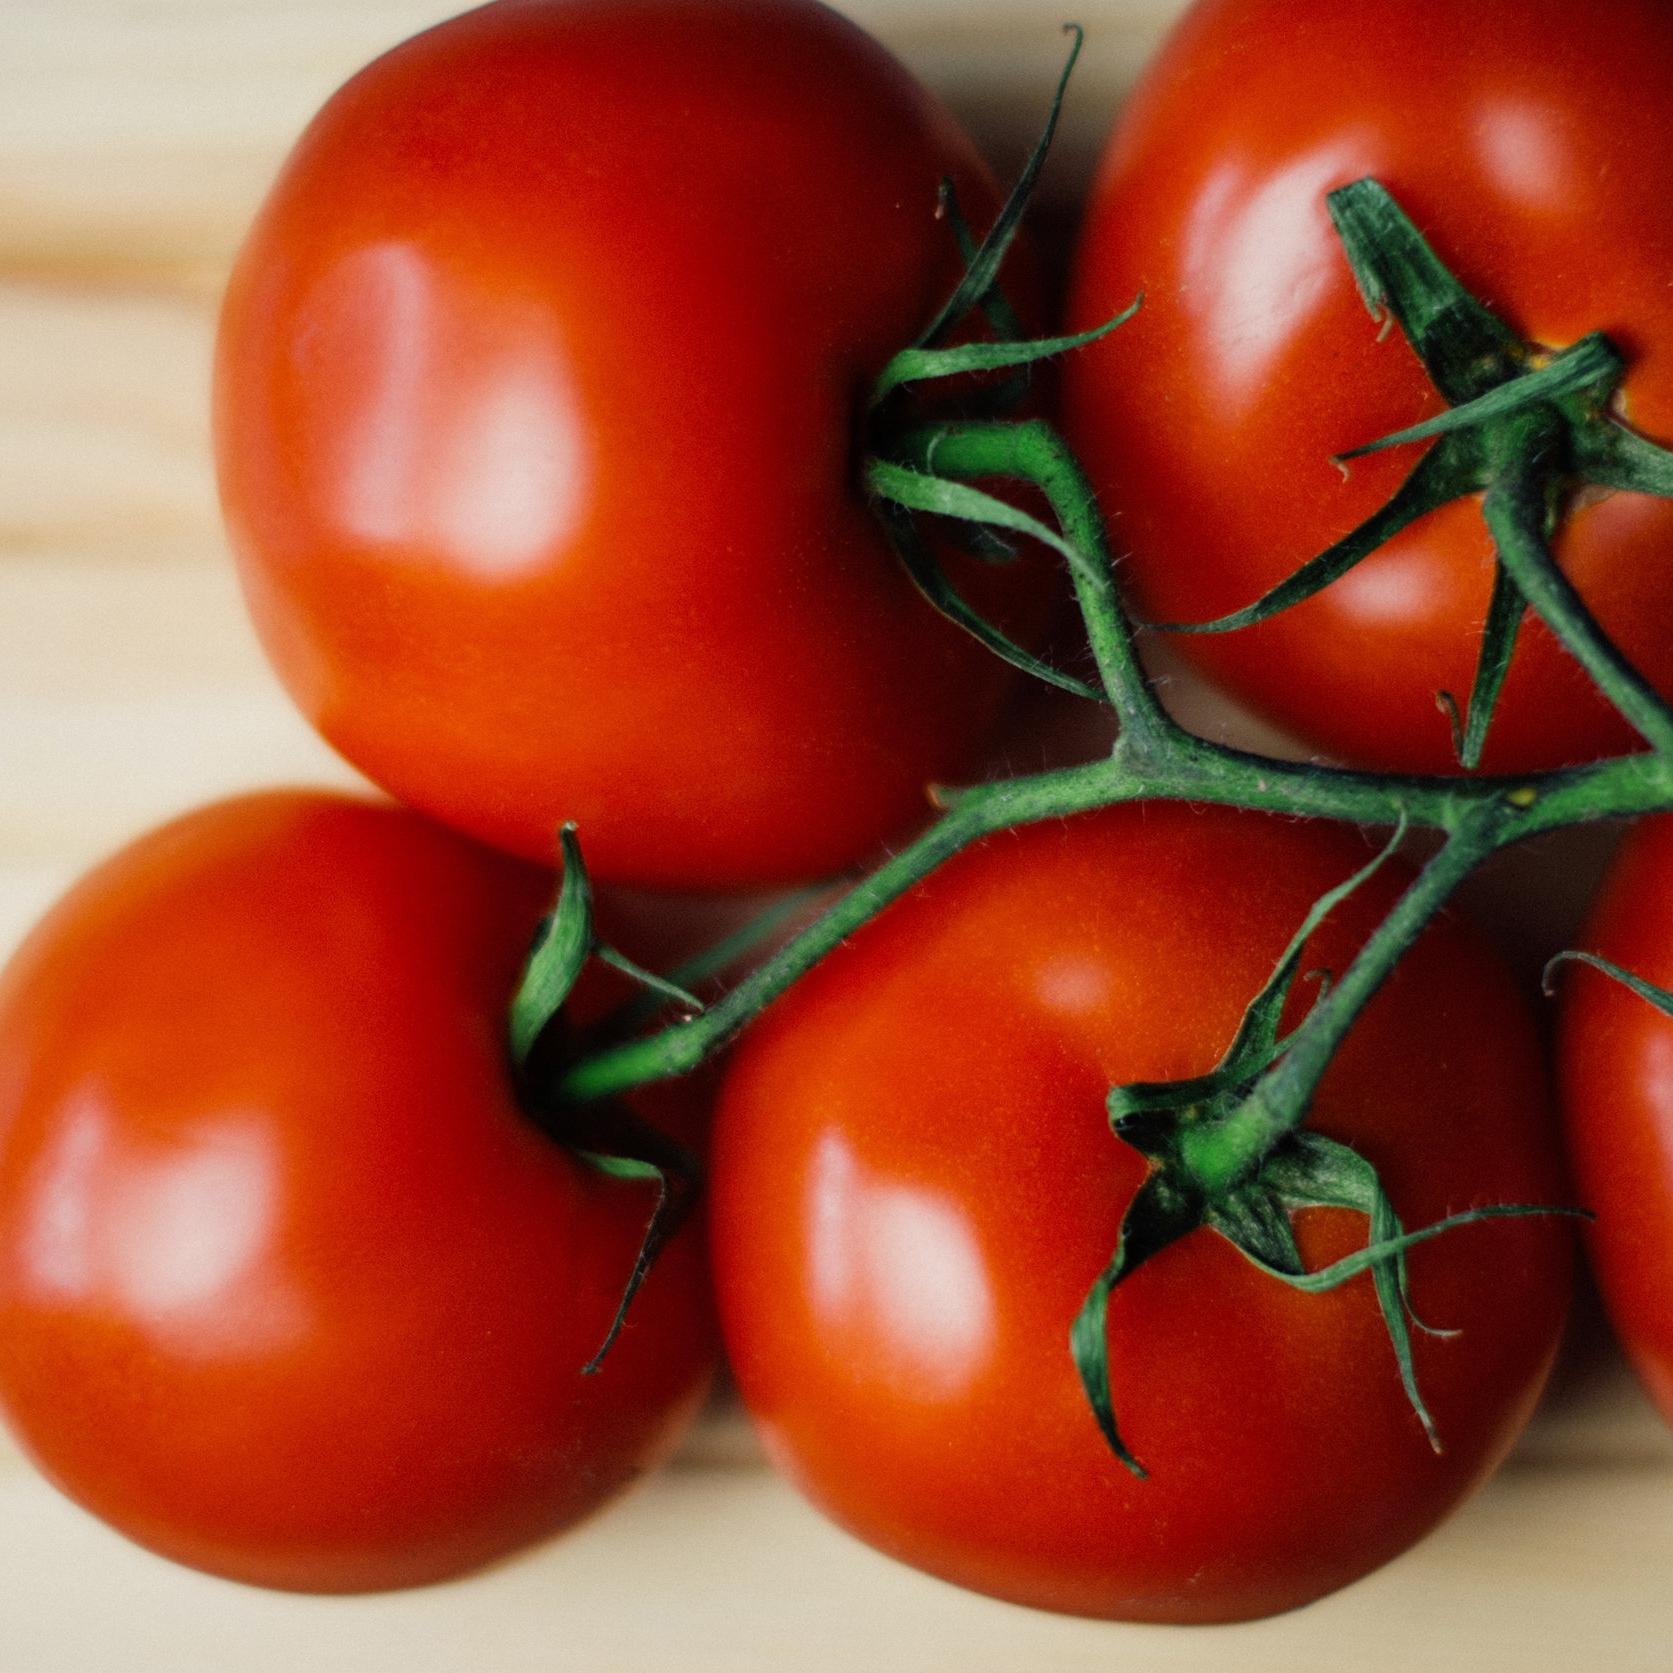 T omato     Healing Nutrient:Lycopene   Promotes Prostate Health    Slow-Roasted Tomatoes Recipe